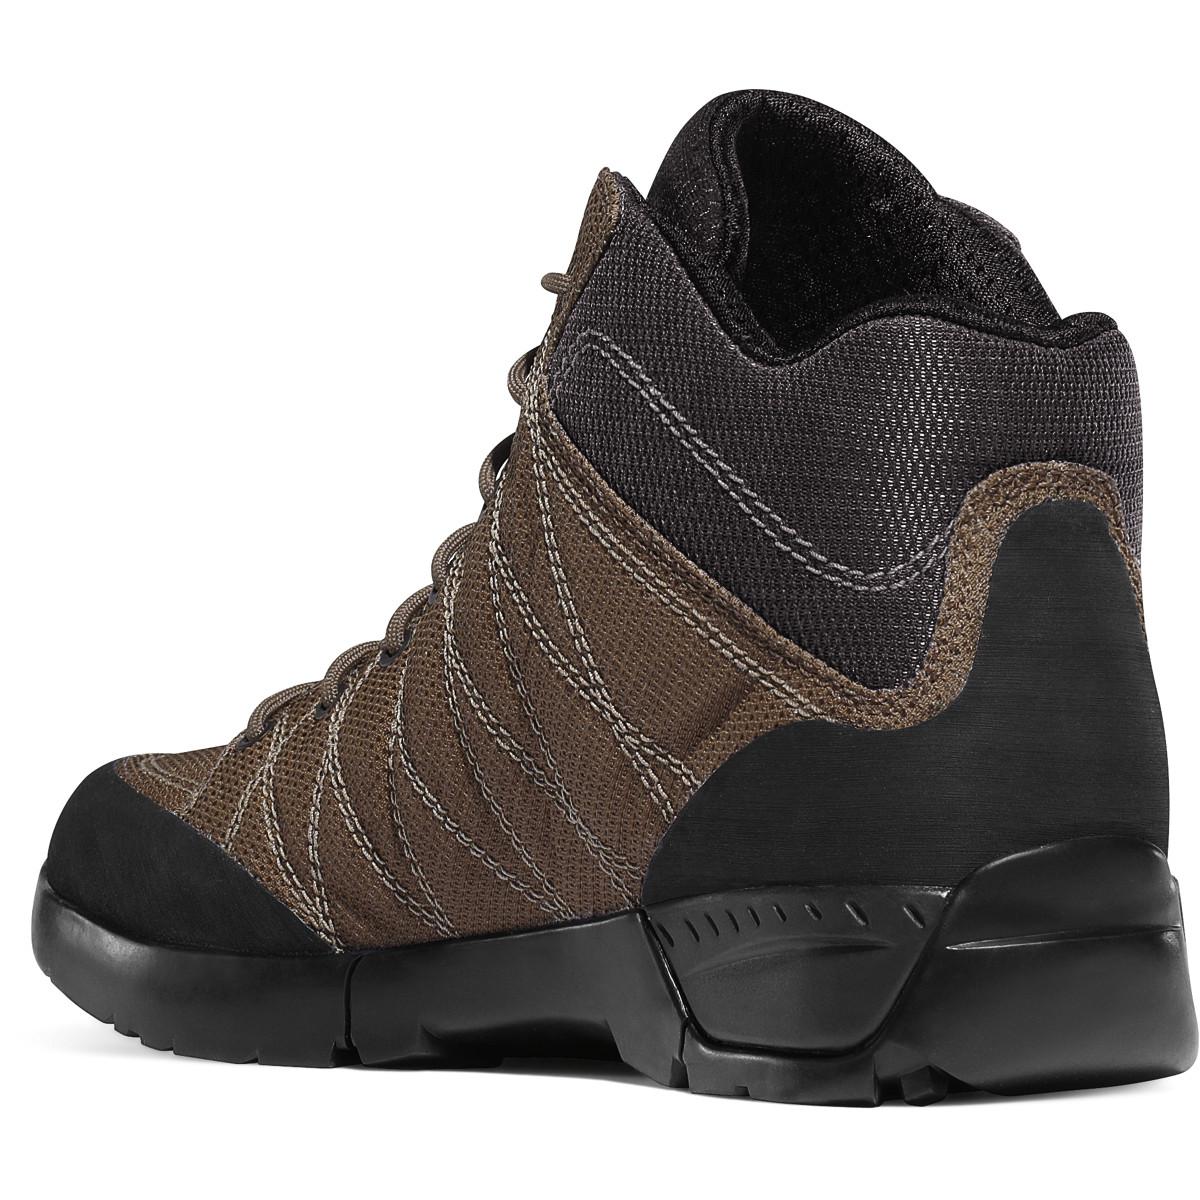 Danner Melee Canteen Tactical Boots | eBay